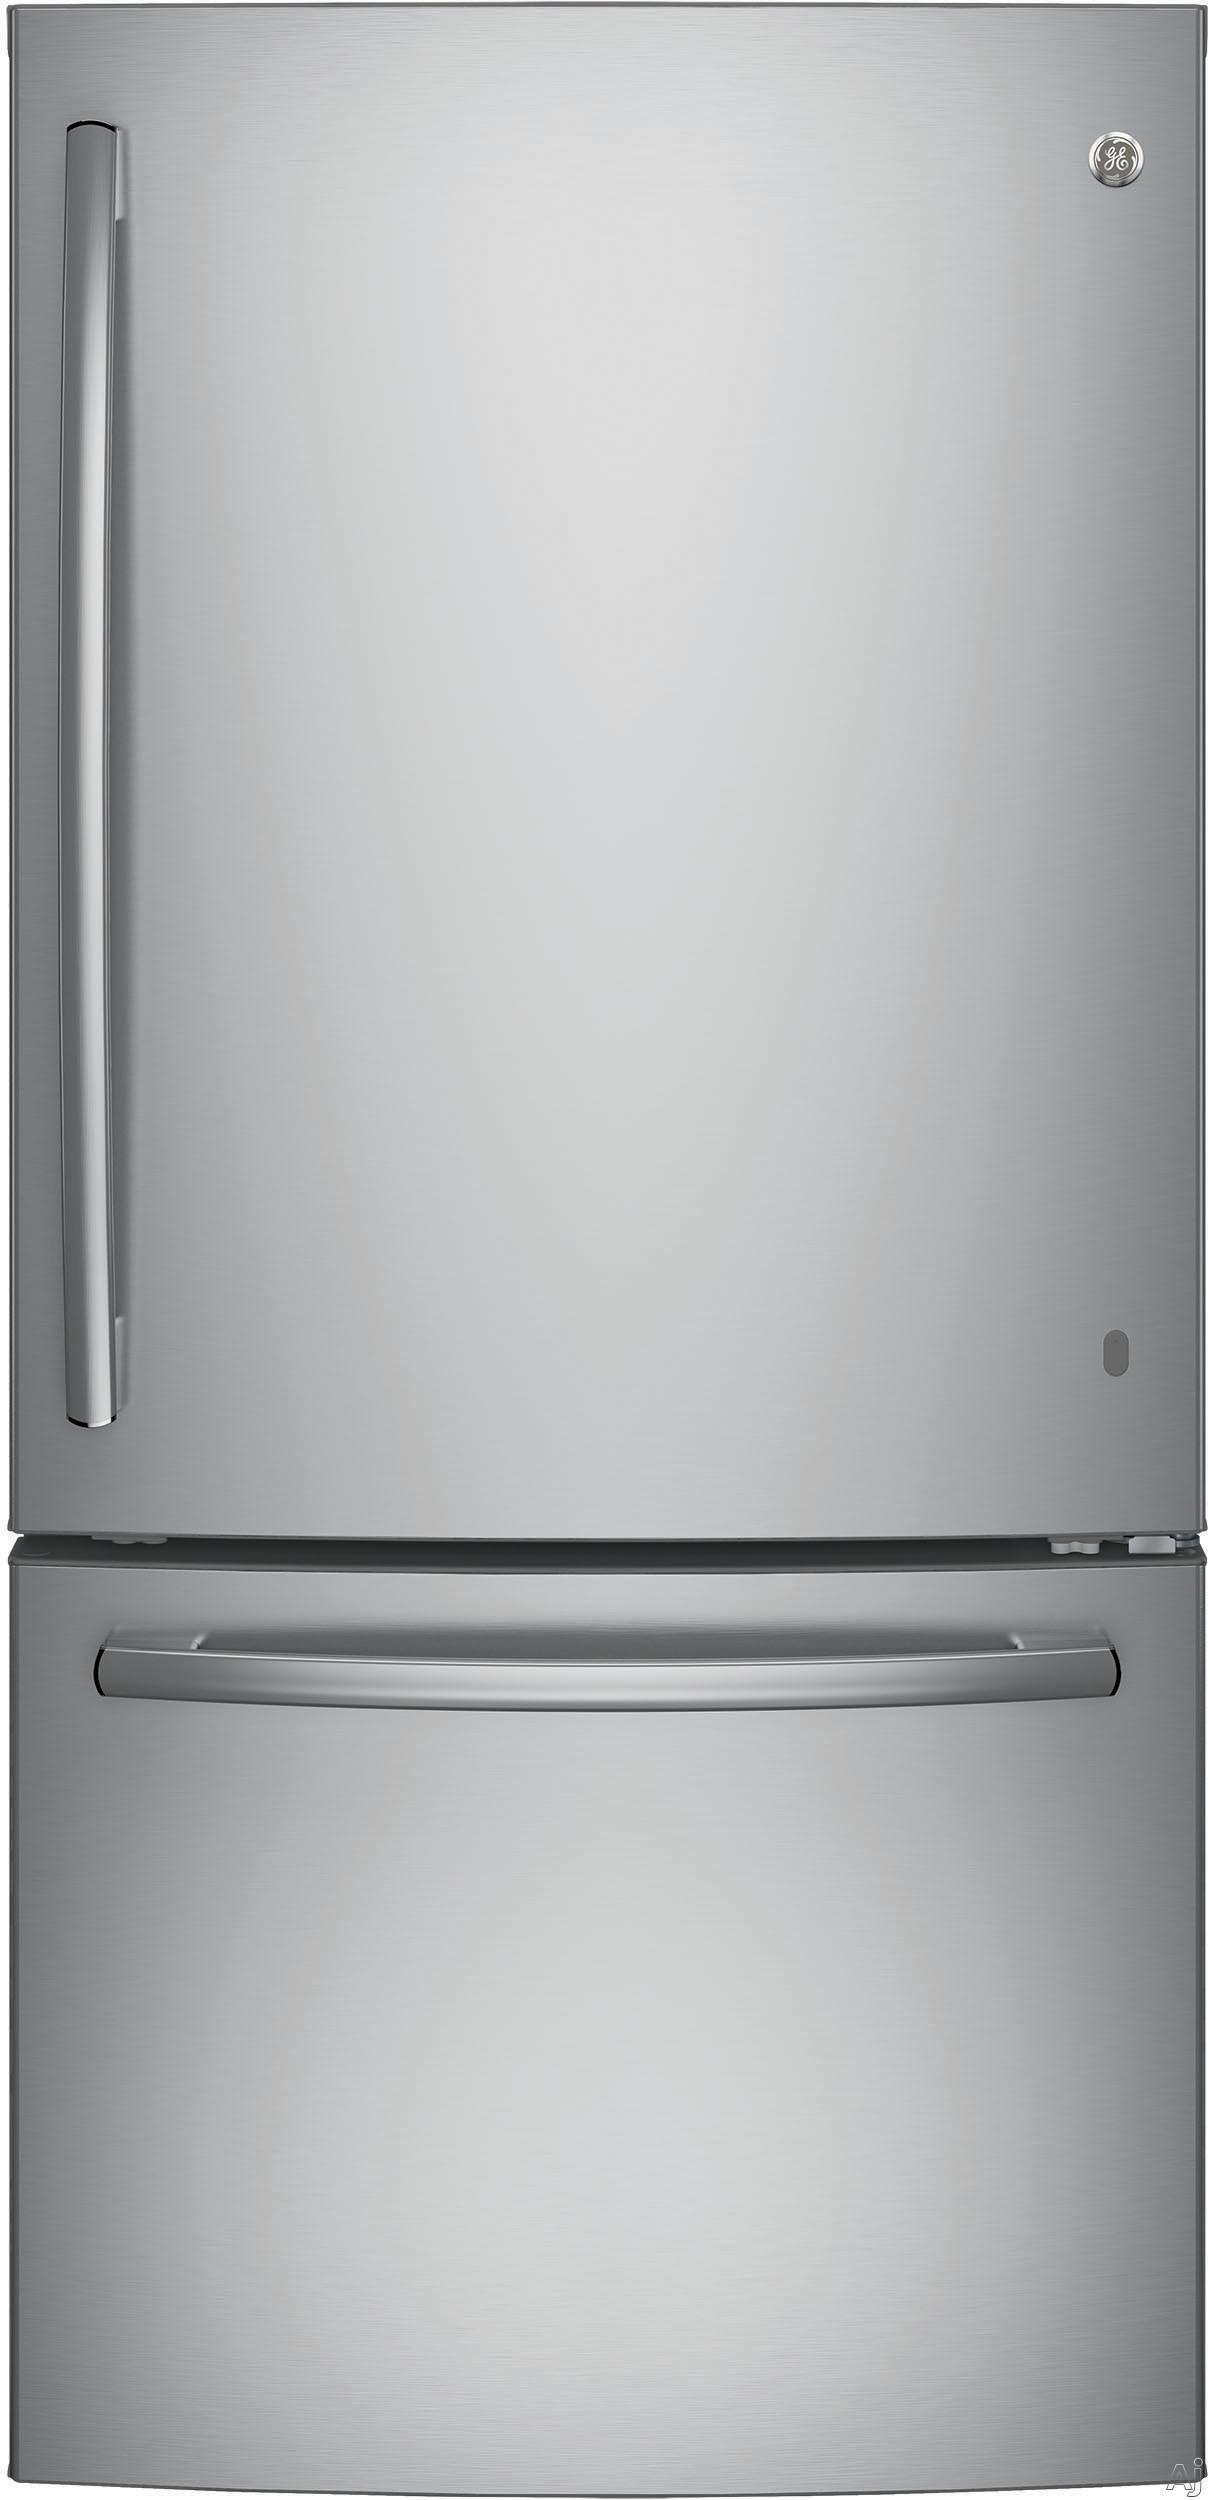 GE Refrigeration,GE Refrigerators,GE Bottom Mount Refrigerators